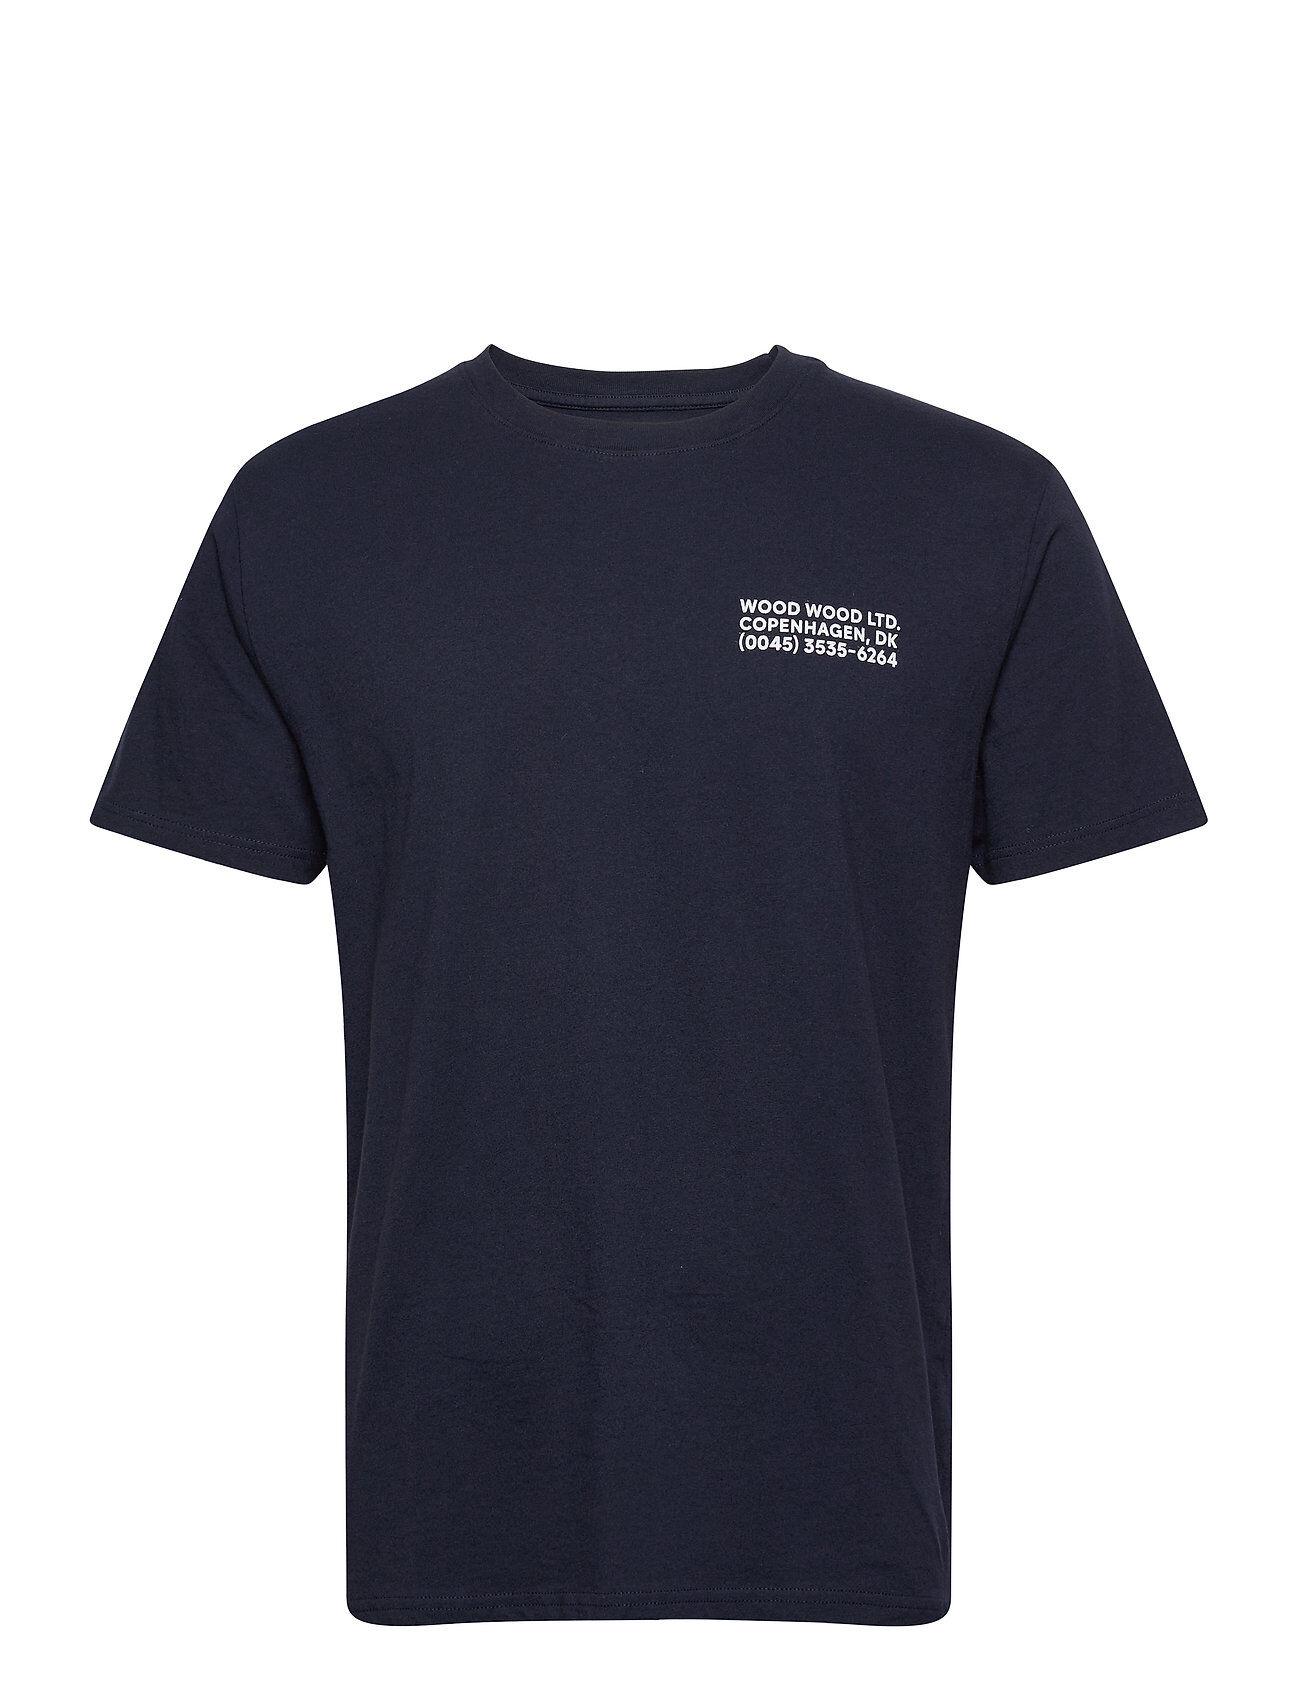 Wood Wood Info T-Shirt T-shirts Short-sleeved Blå Wood Wood